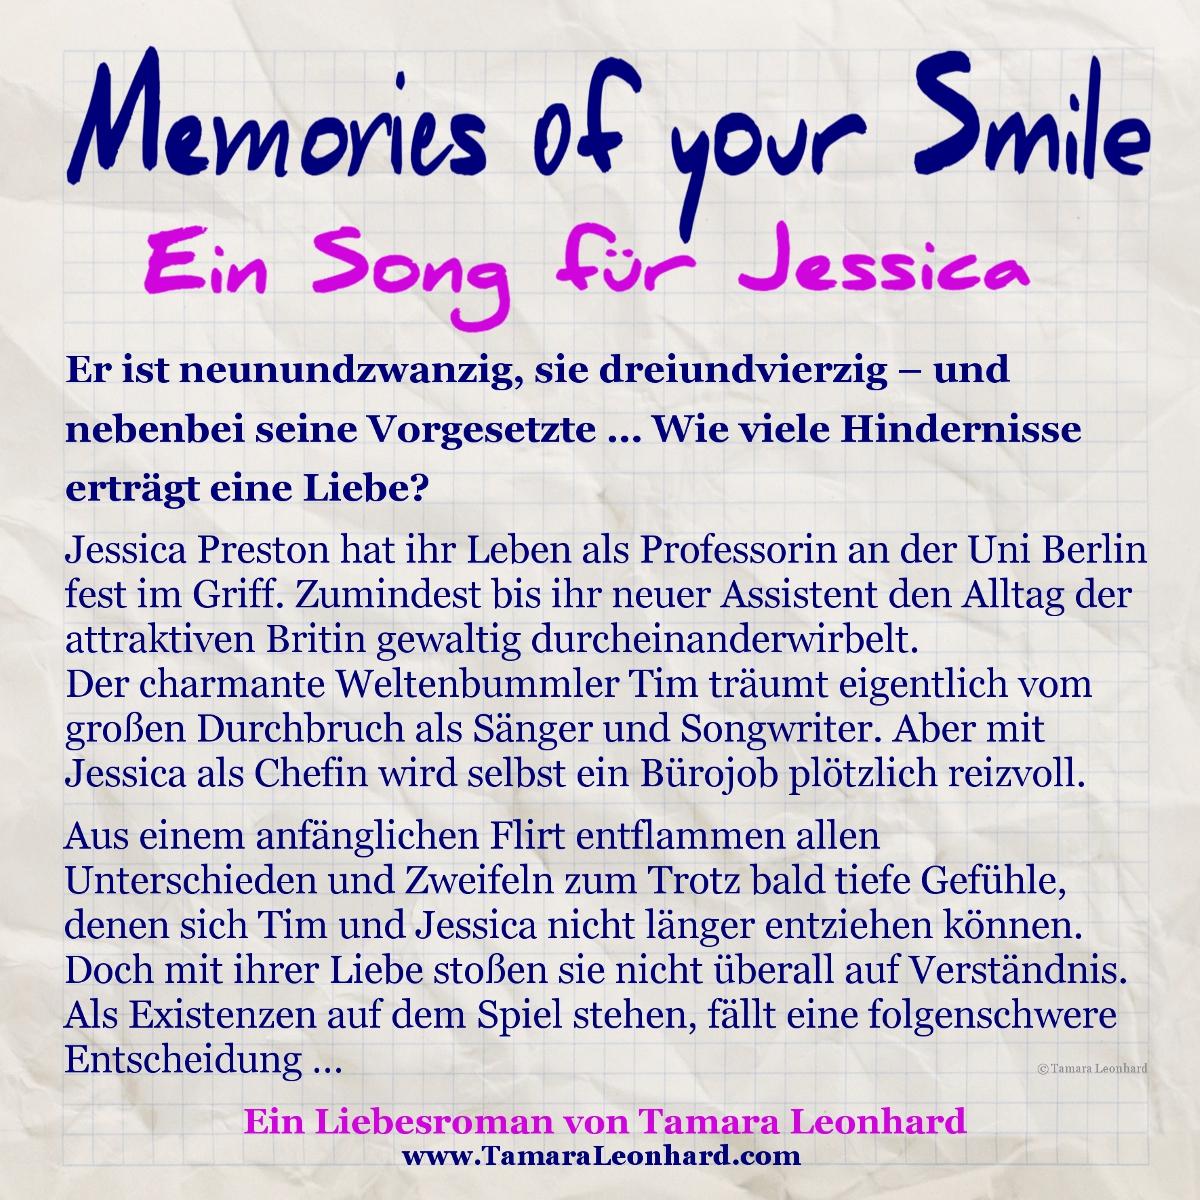 Memories of your Smile - Tamara Leonhard - Klappentext